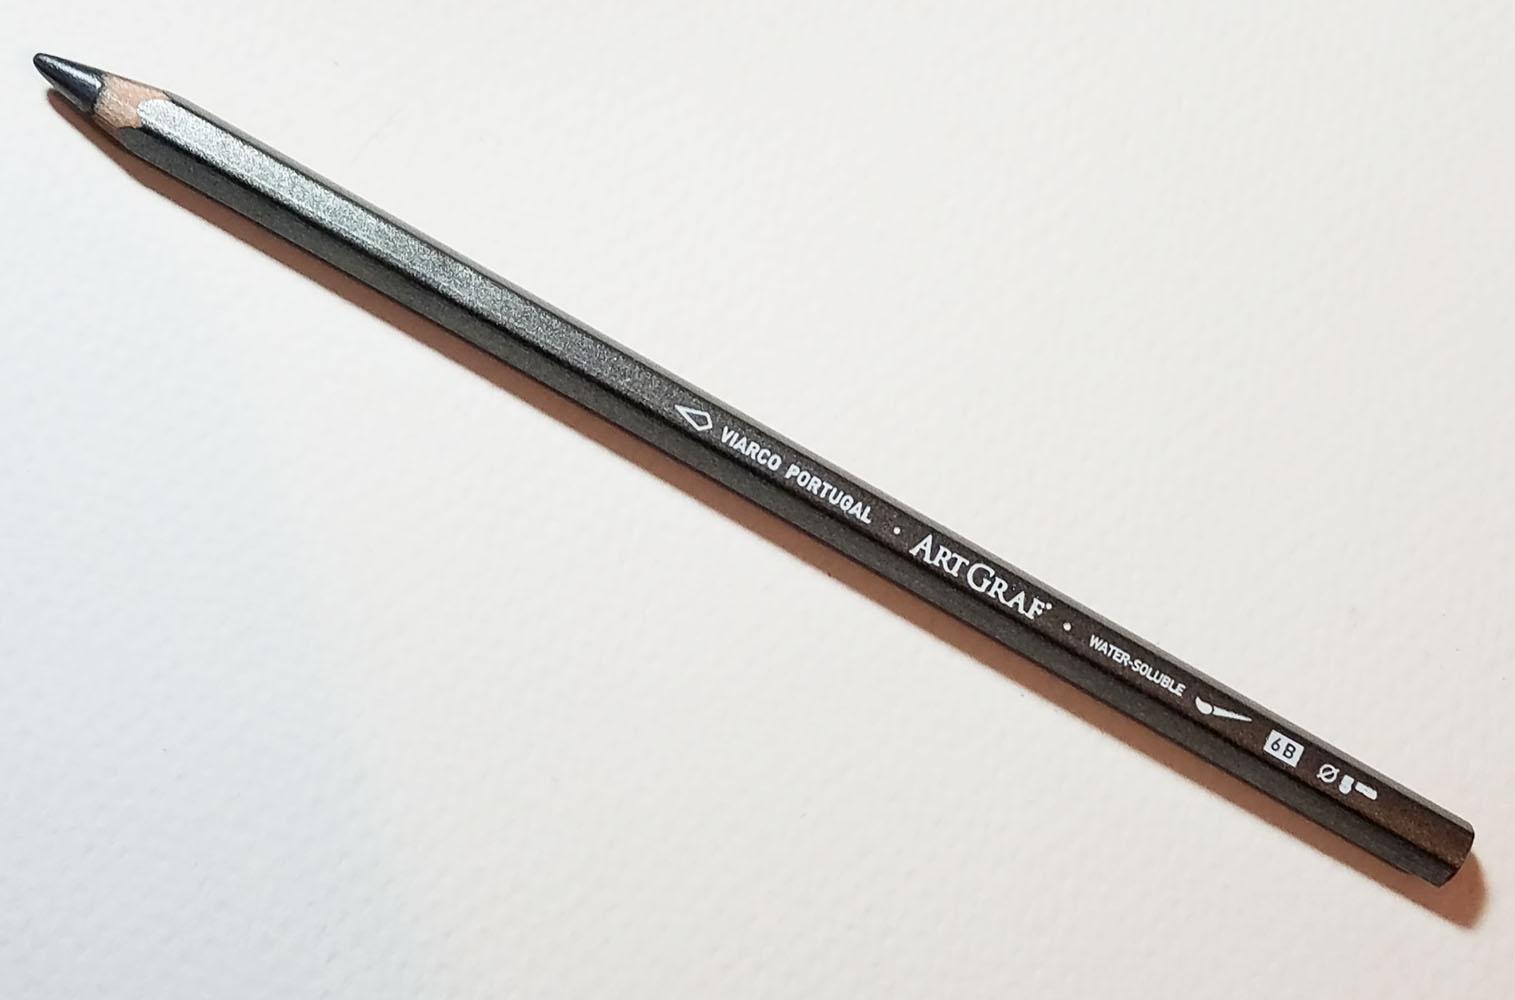 ArtGraf Watersoluble Graphite Pencils 2B 6B